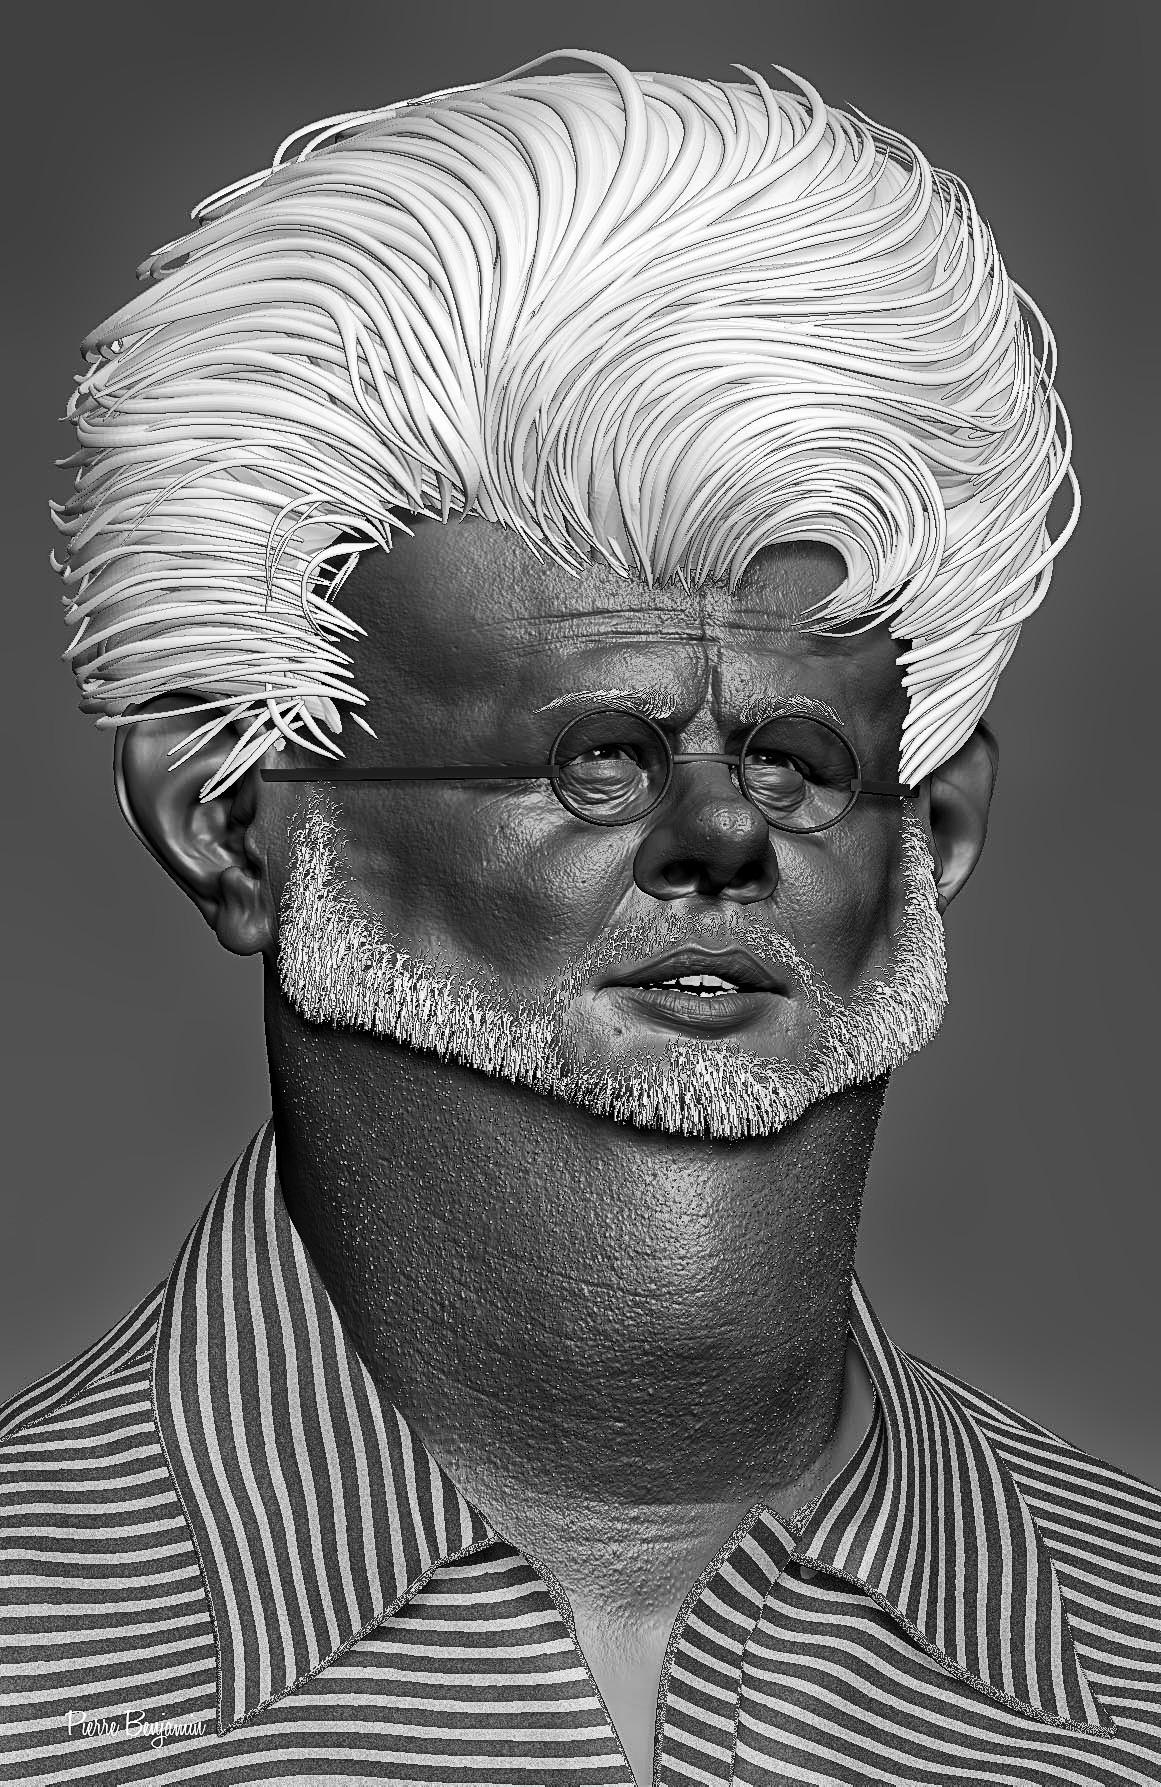 Pierre benjamin georgio